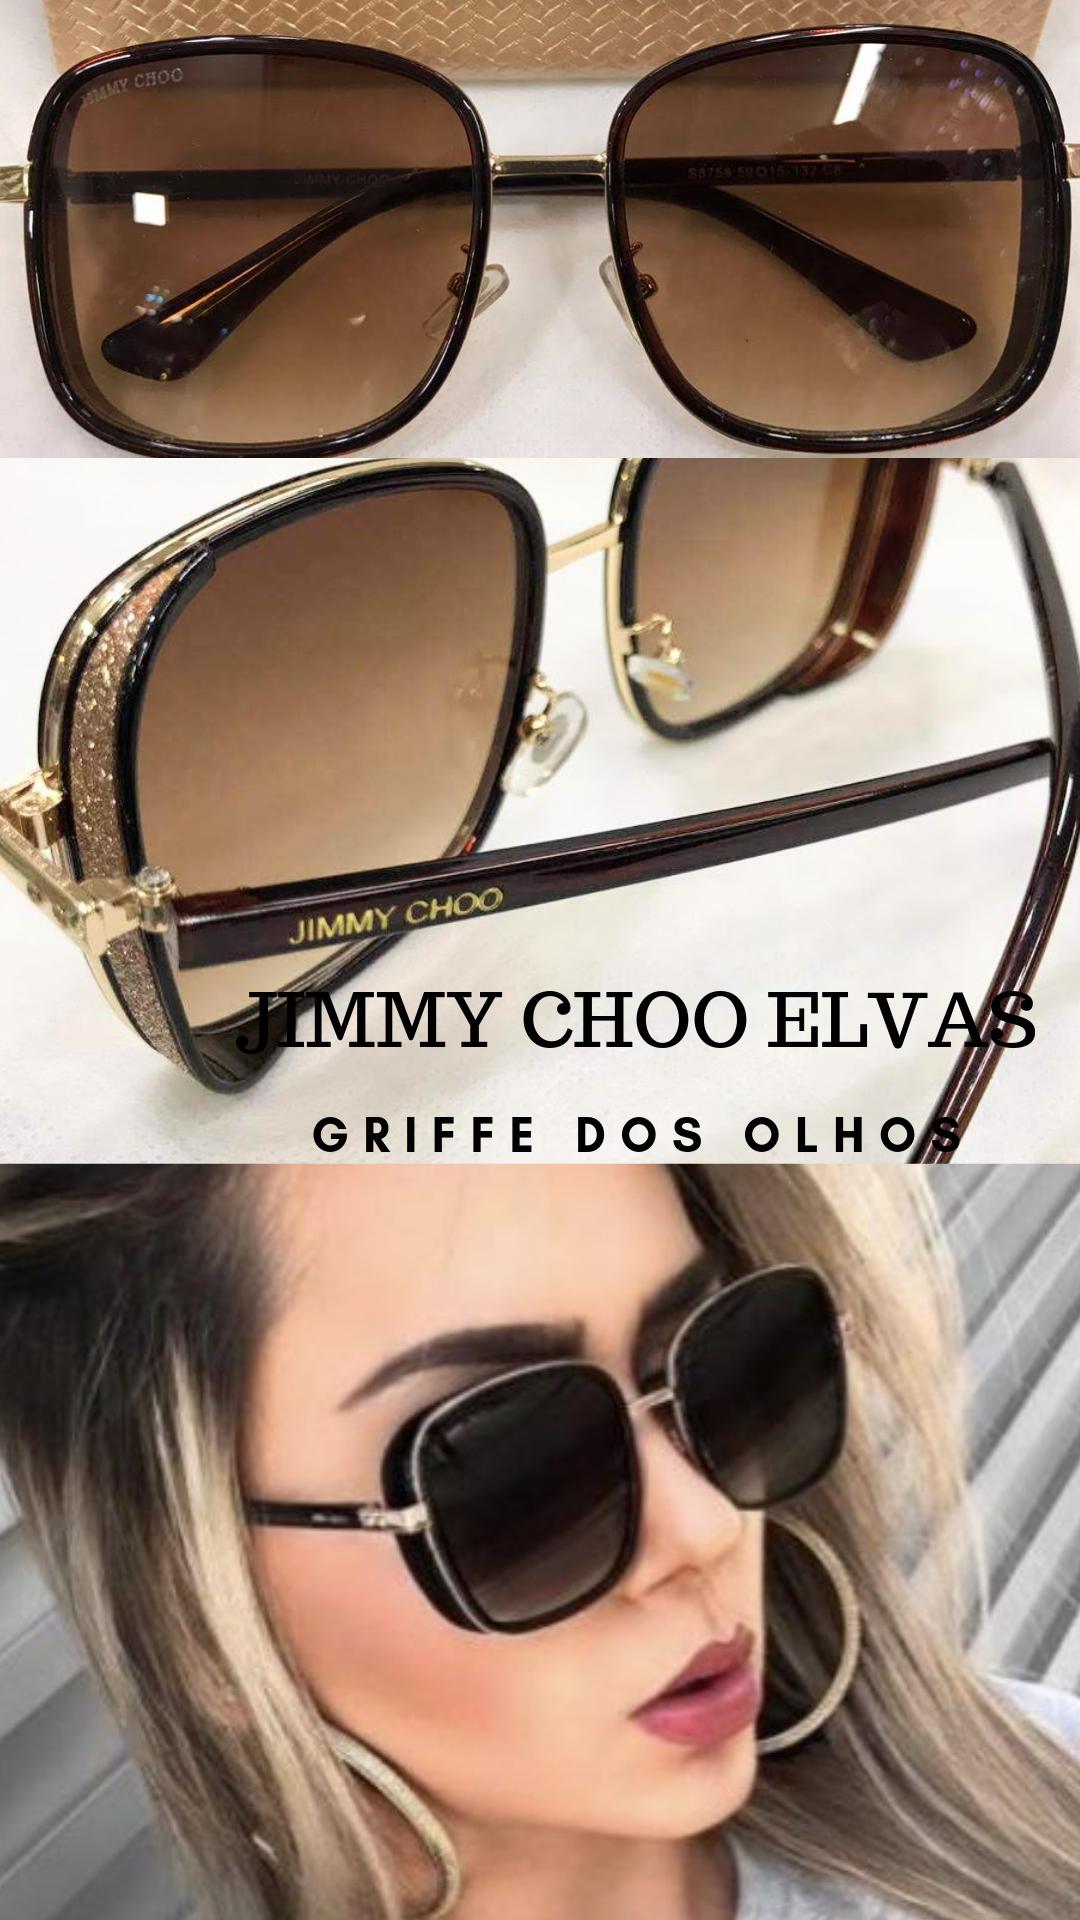 7c2378907 JIMMY CHOO MARROM- ELVAS 2M2 T4 A - ÓCULOS DE SOL #oculosjimmychoo  #jimmychoo #oculostendencia #oculos2019 #oculosdesol #oculosfeminino